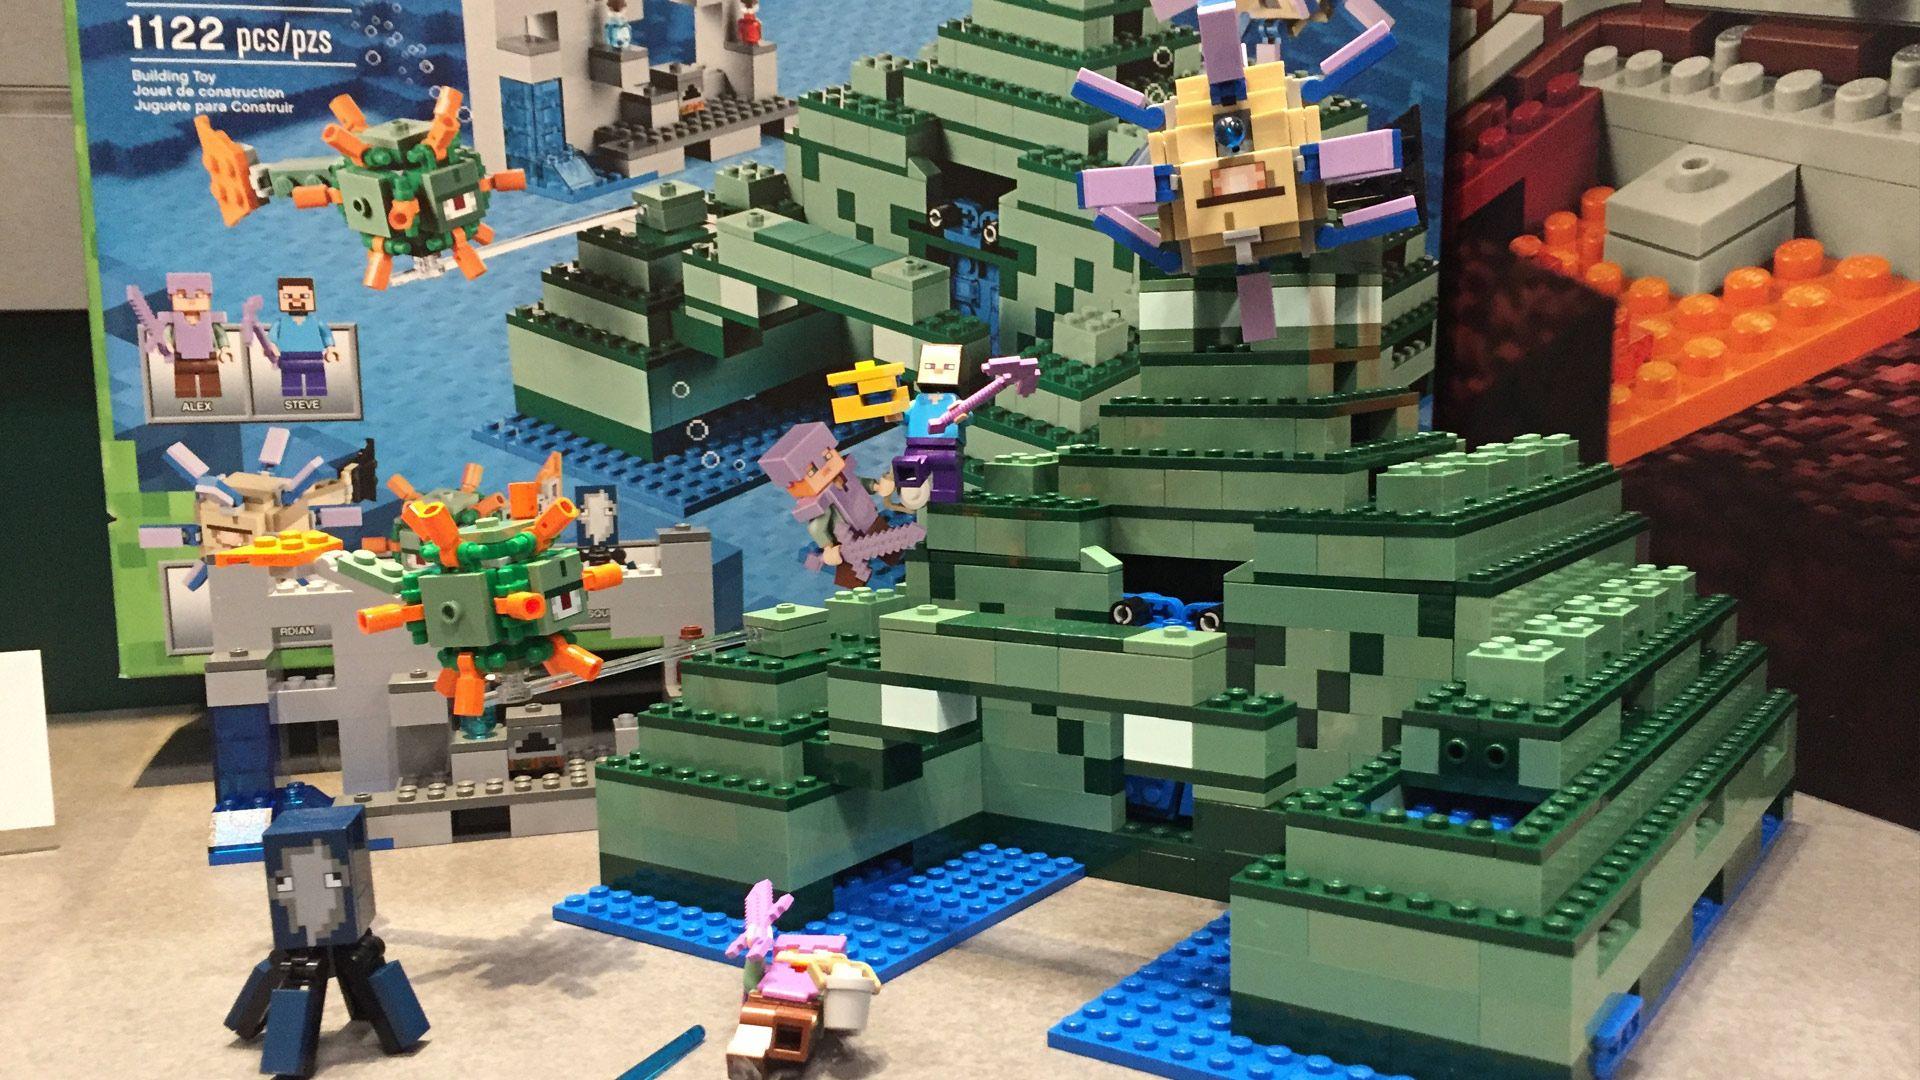 #LEGO #Minecraft Sets 2017 at Toy Fair 2017 ...